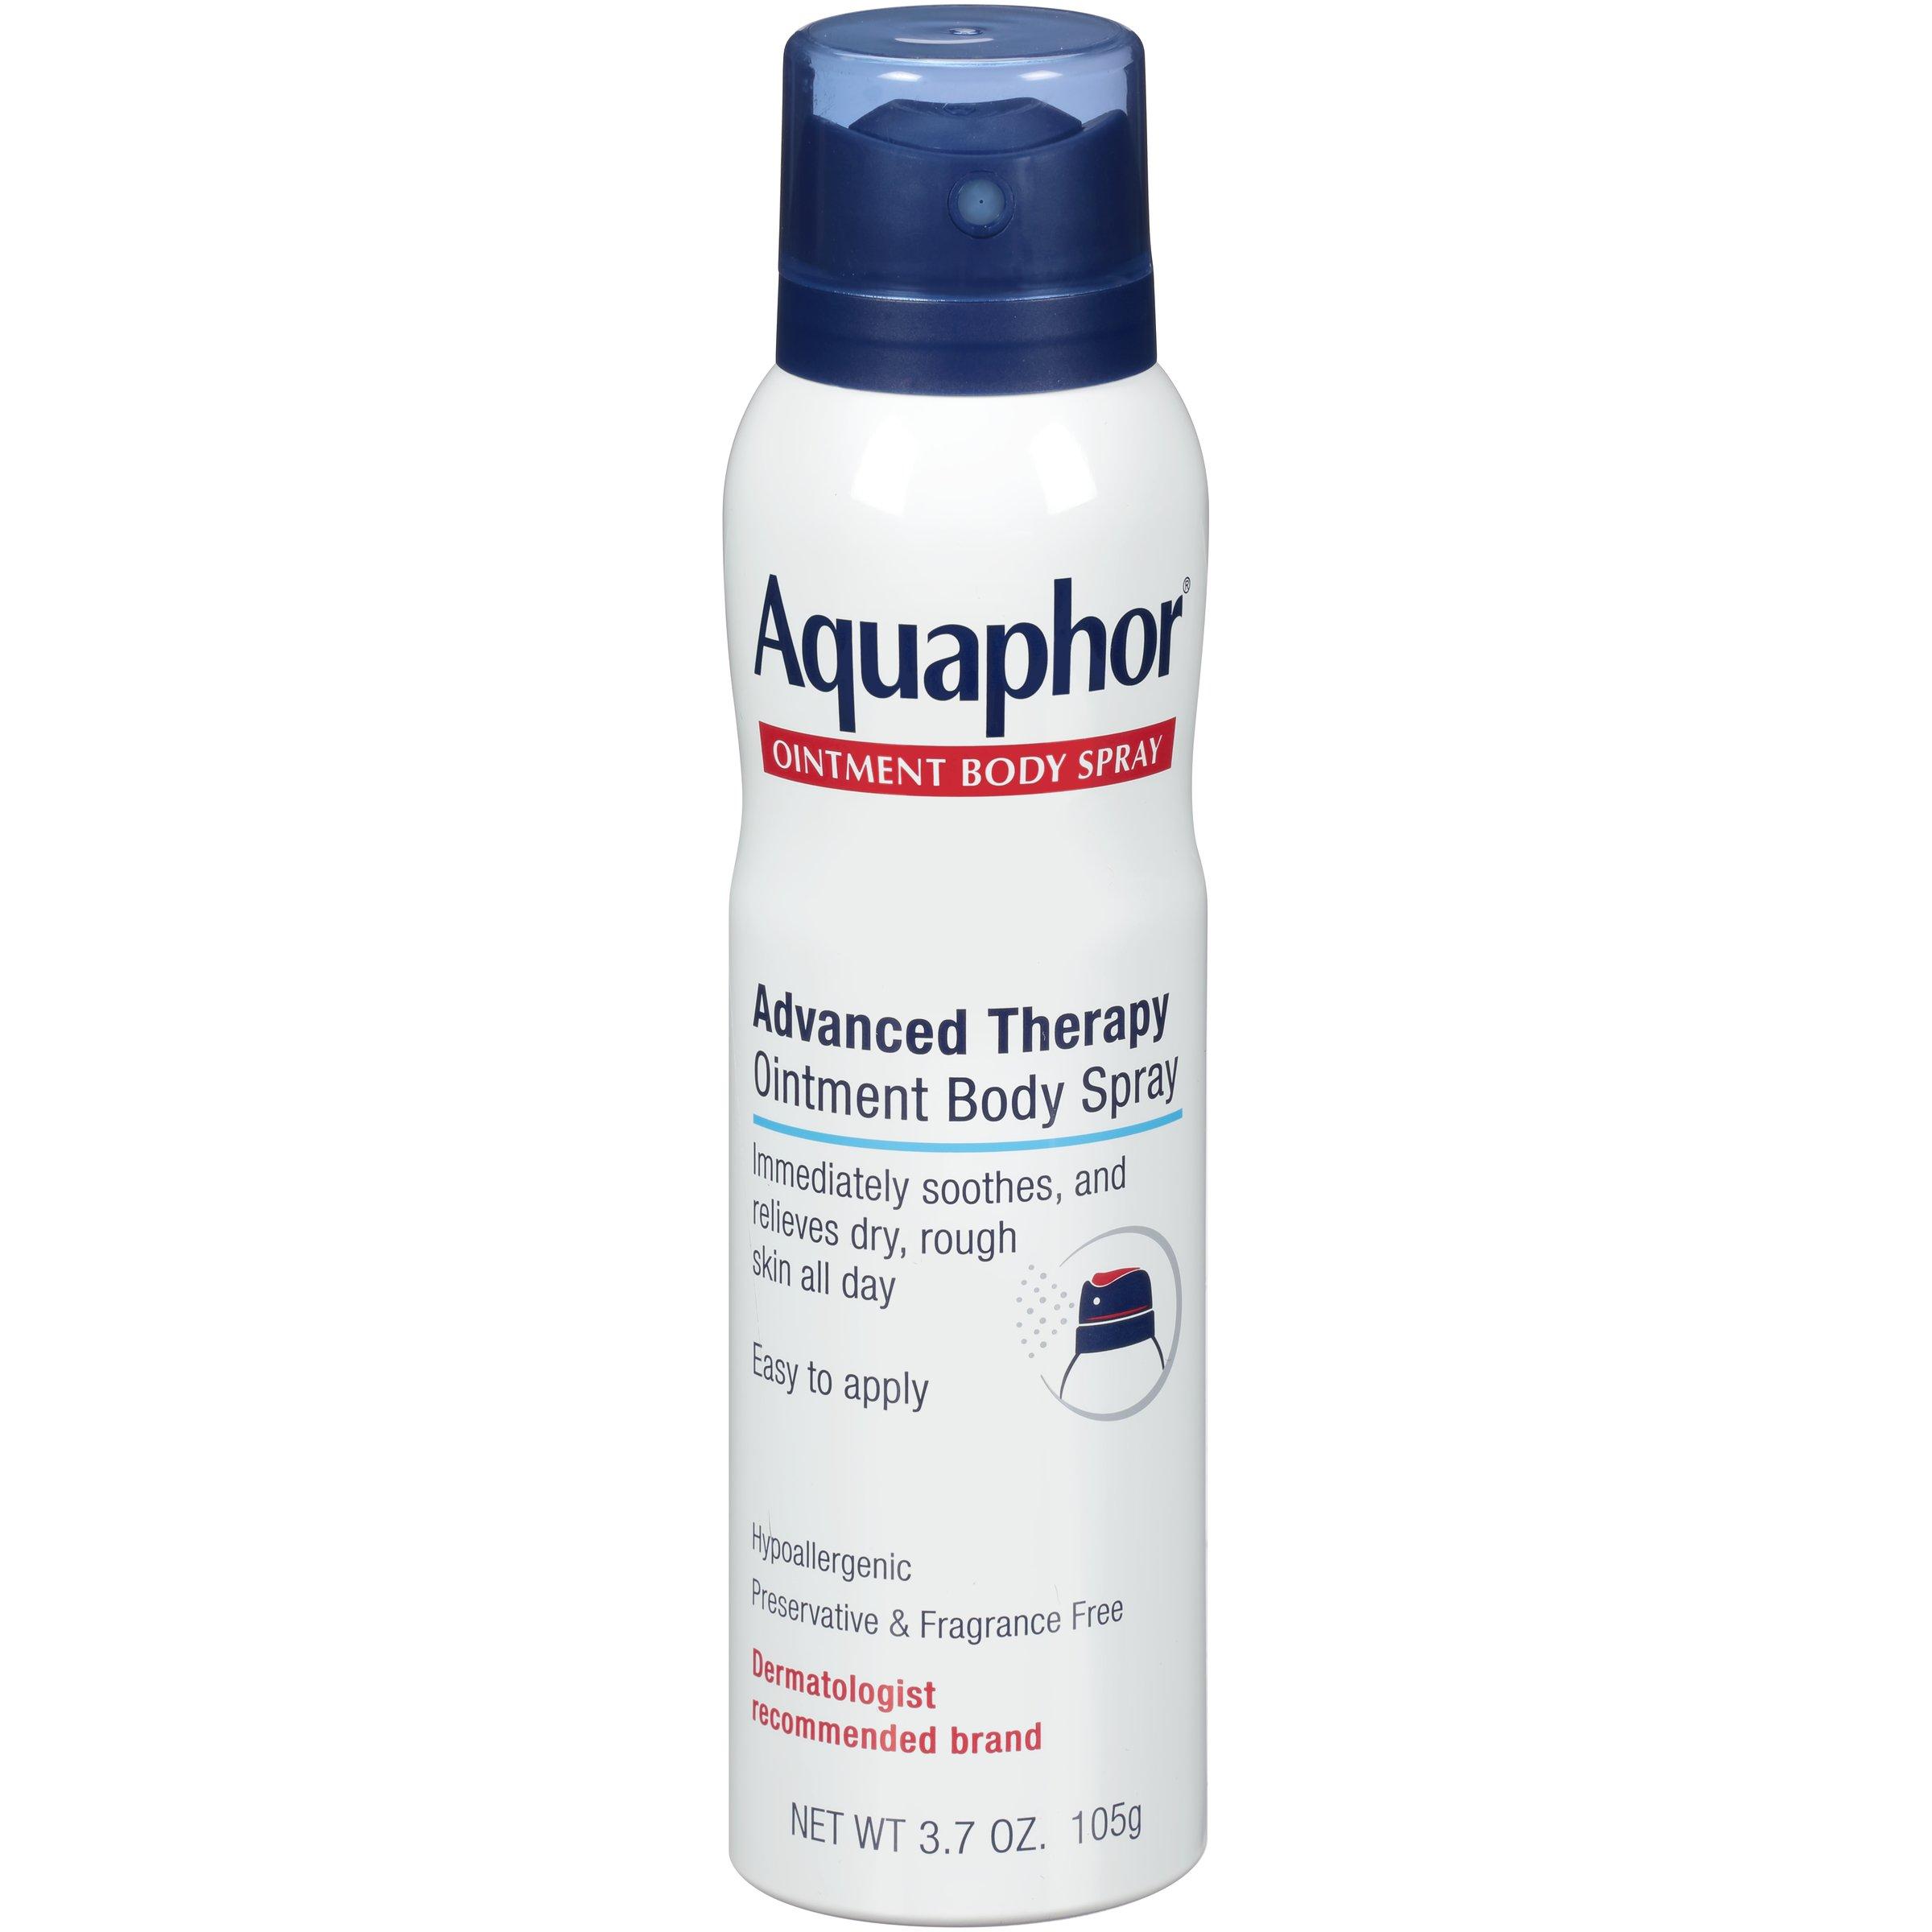 Aquaphor Ointment Body Spray - Moisturizes to Help Heal Dry, Rough Skin - 3.7 oz. Spray Can